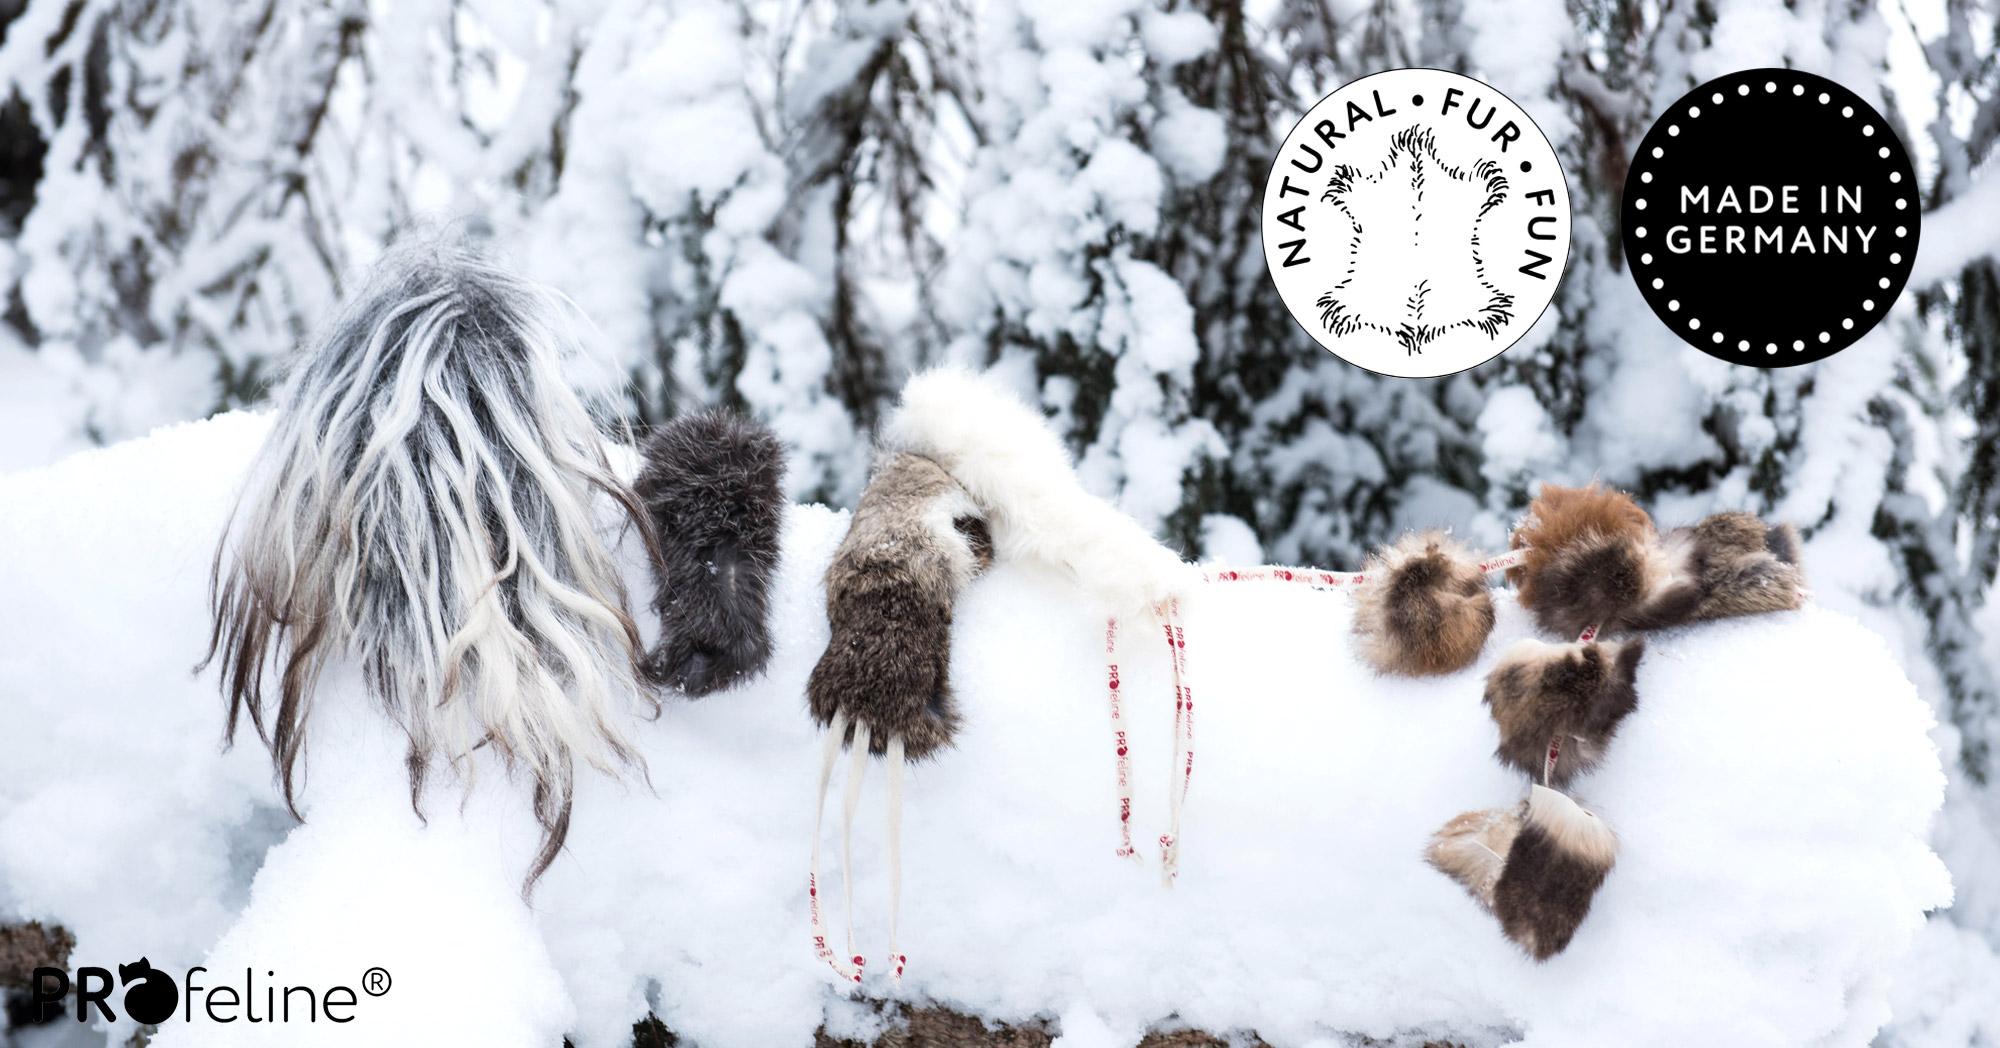 Natural Fur Fun - Katzenspielzeug aus echtem Fell - Made in Germany